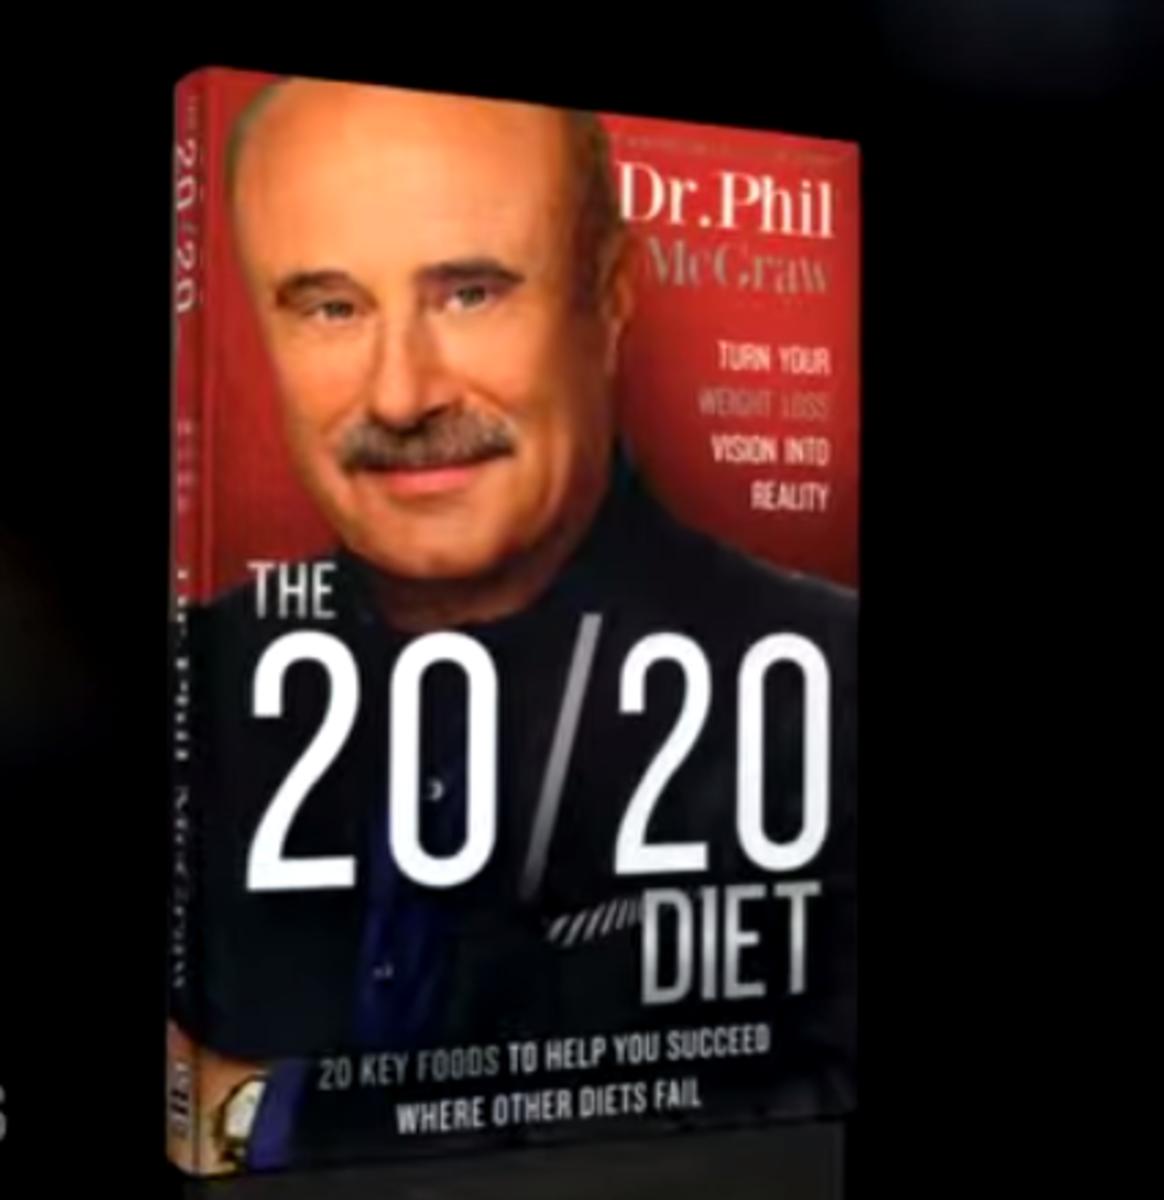 Dr. Phil Diet Plan